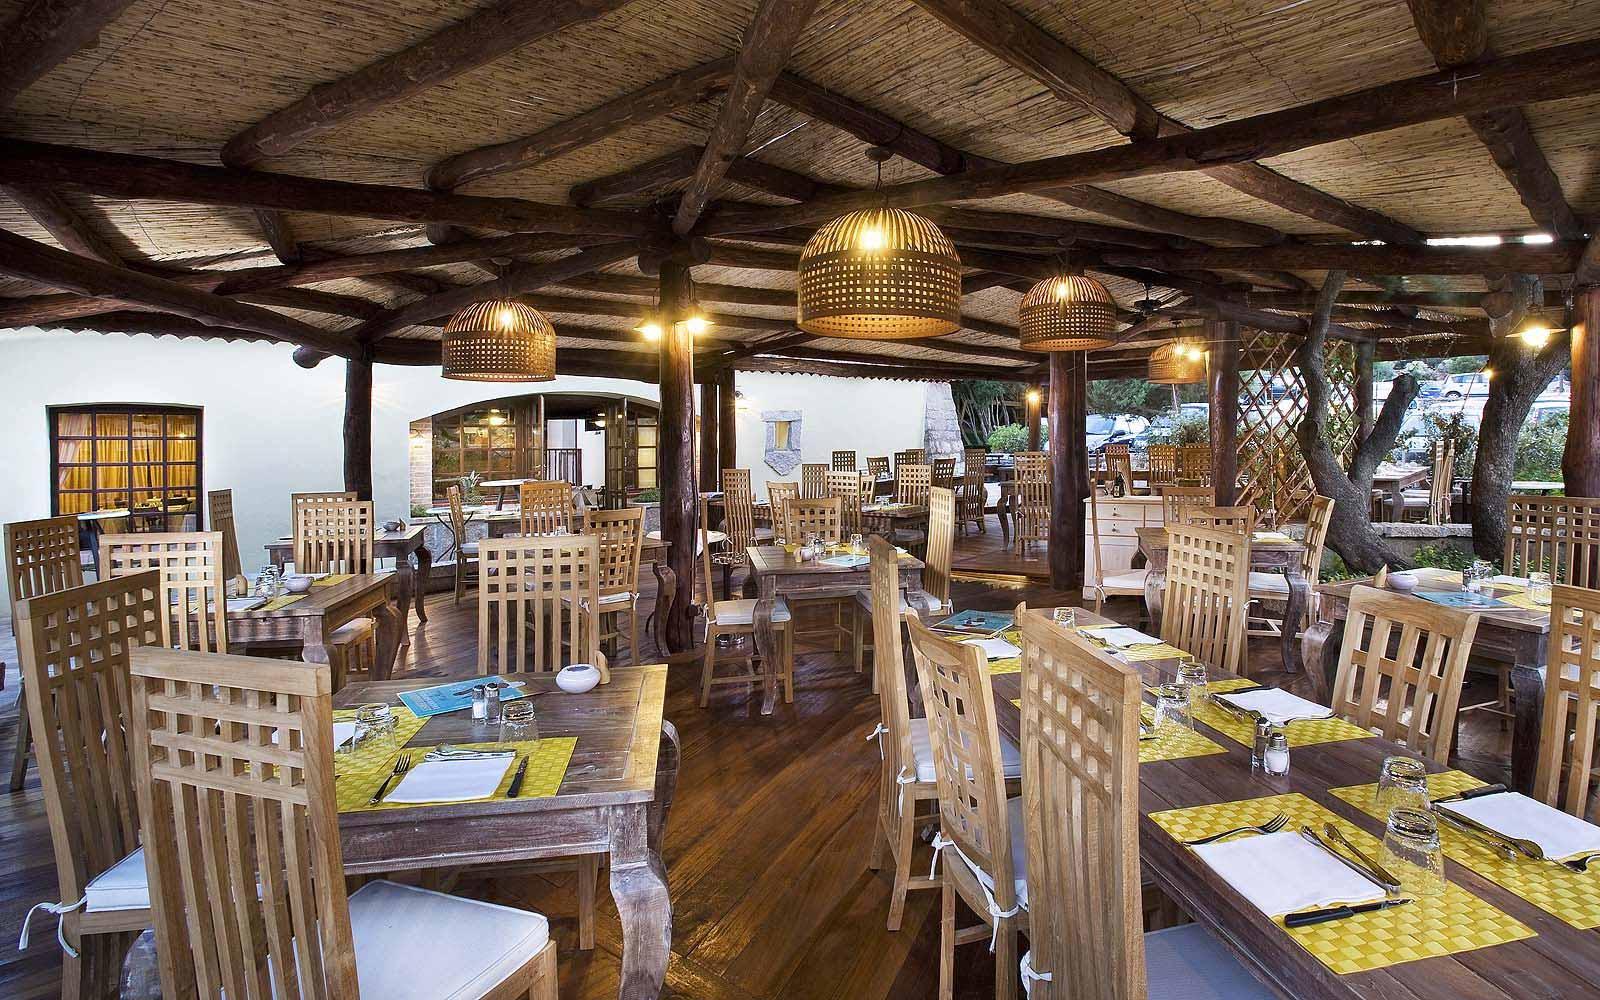 Churrascaria Restaurant in Costa Smeralda